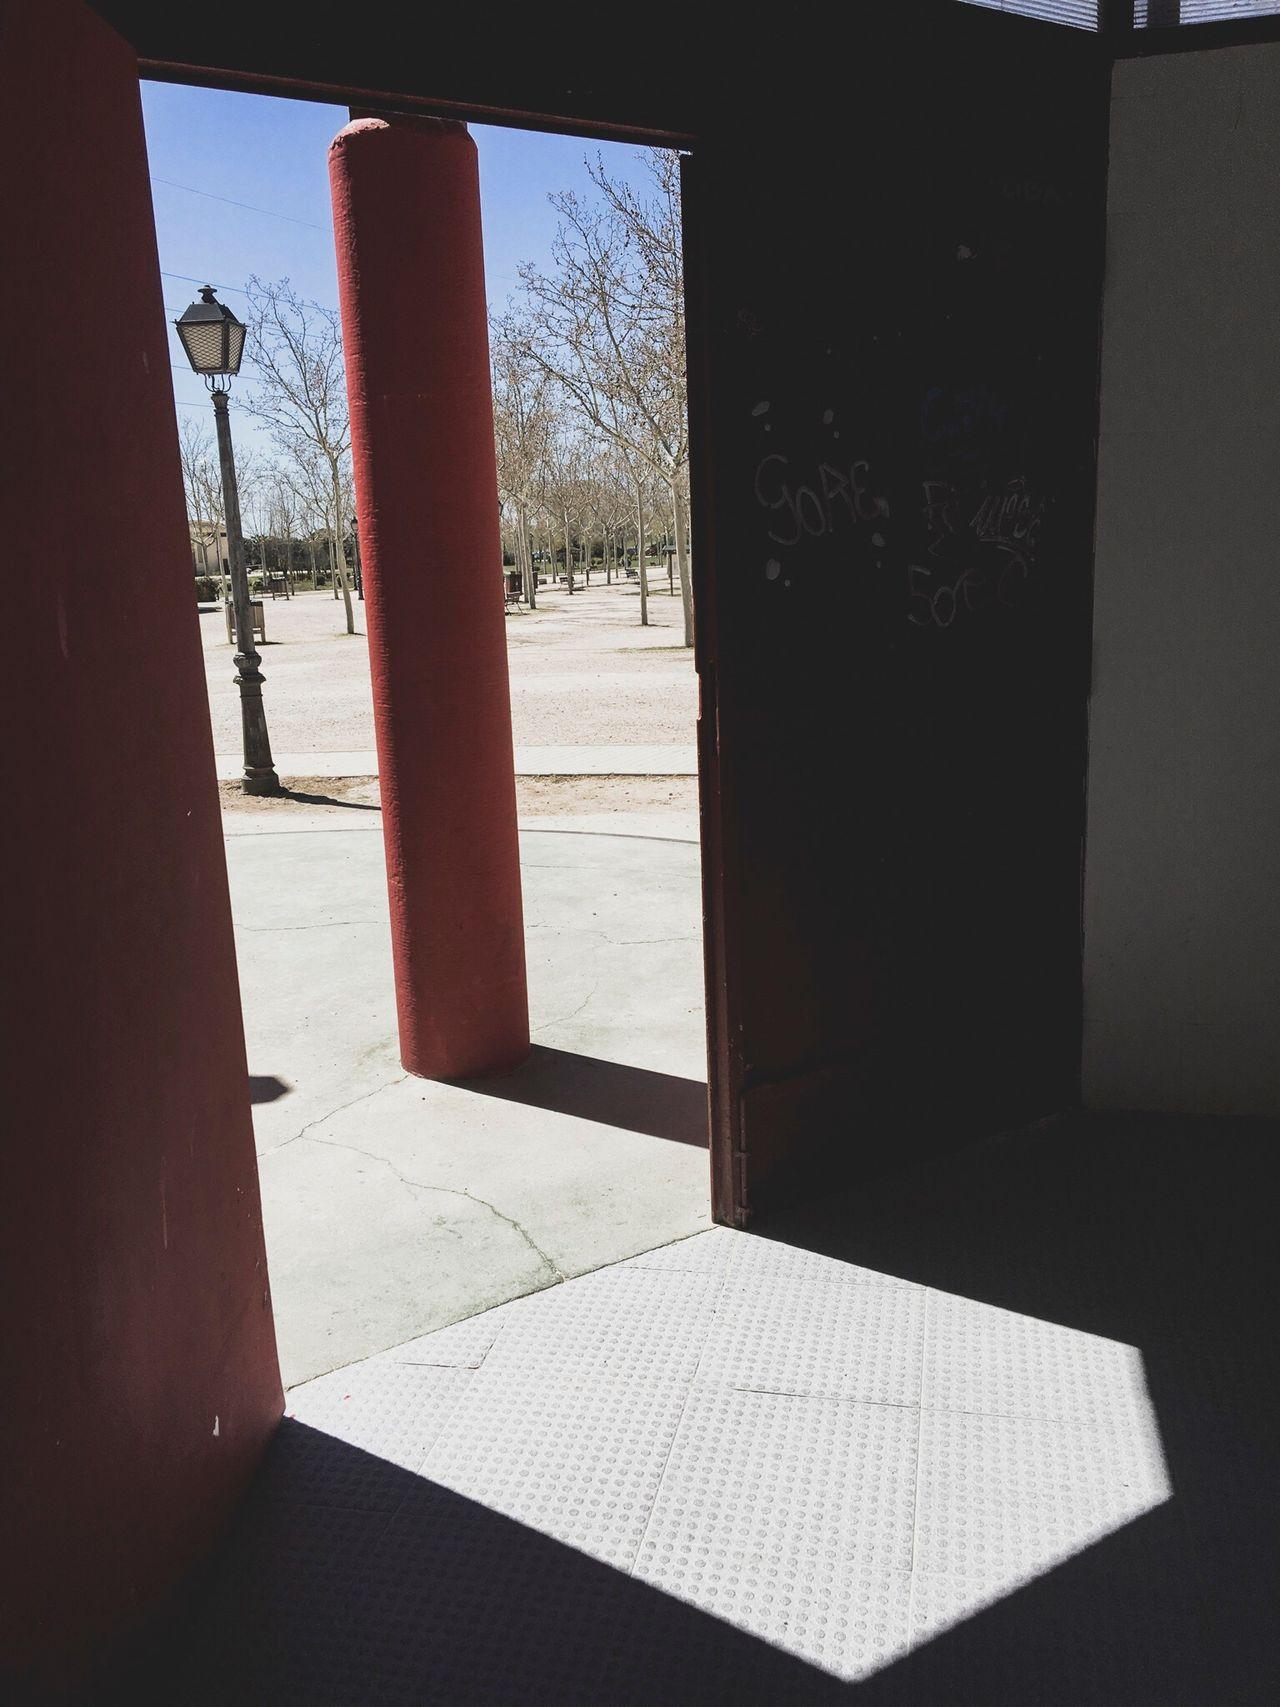 Minimalist Architecture Lines Parallel Contrast David De La Cruz Delacruzfotografia The City Light Fuenlabrada Madrid